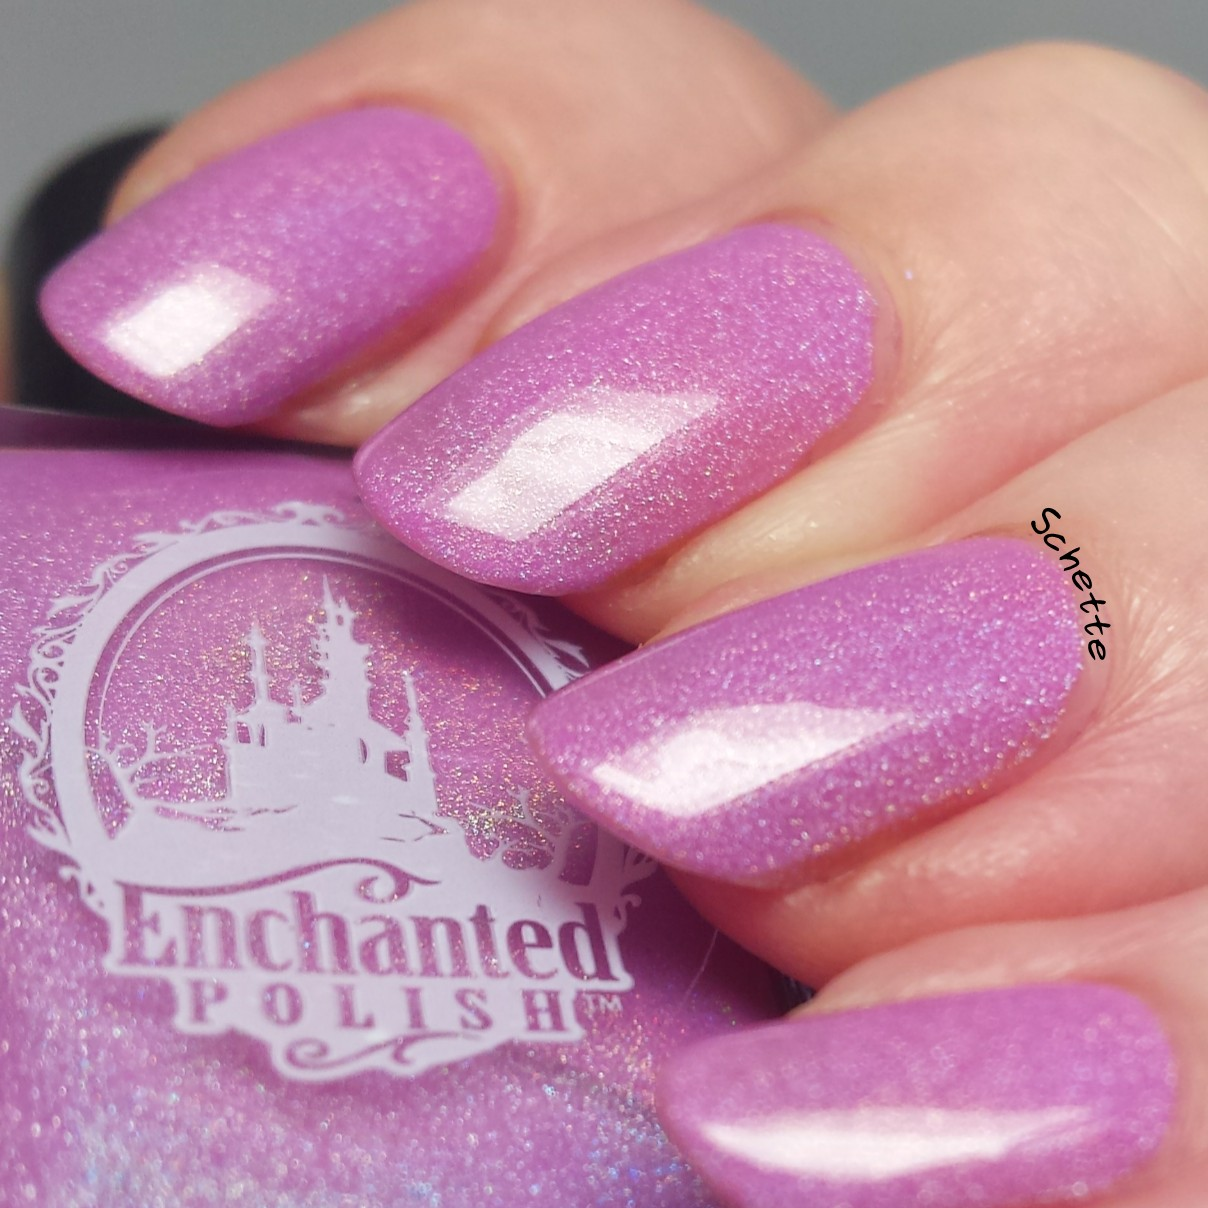 Enchanted Polish : I'm kind of a big deal